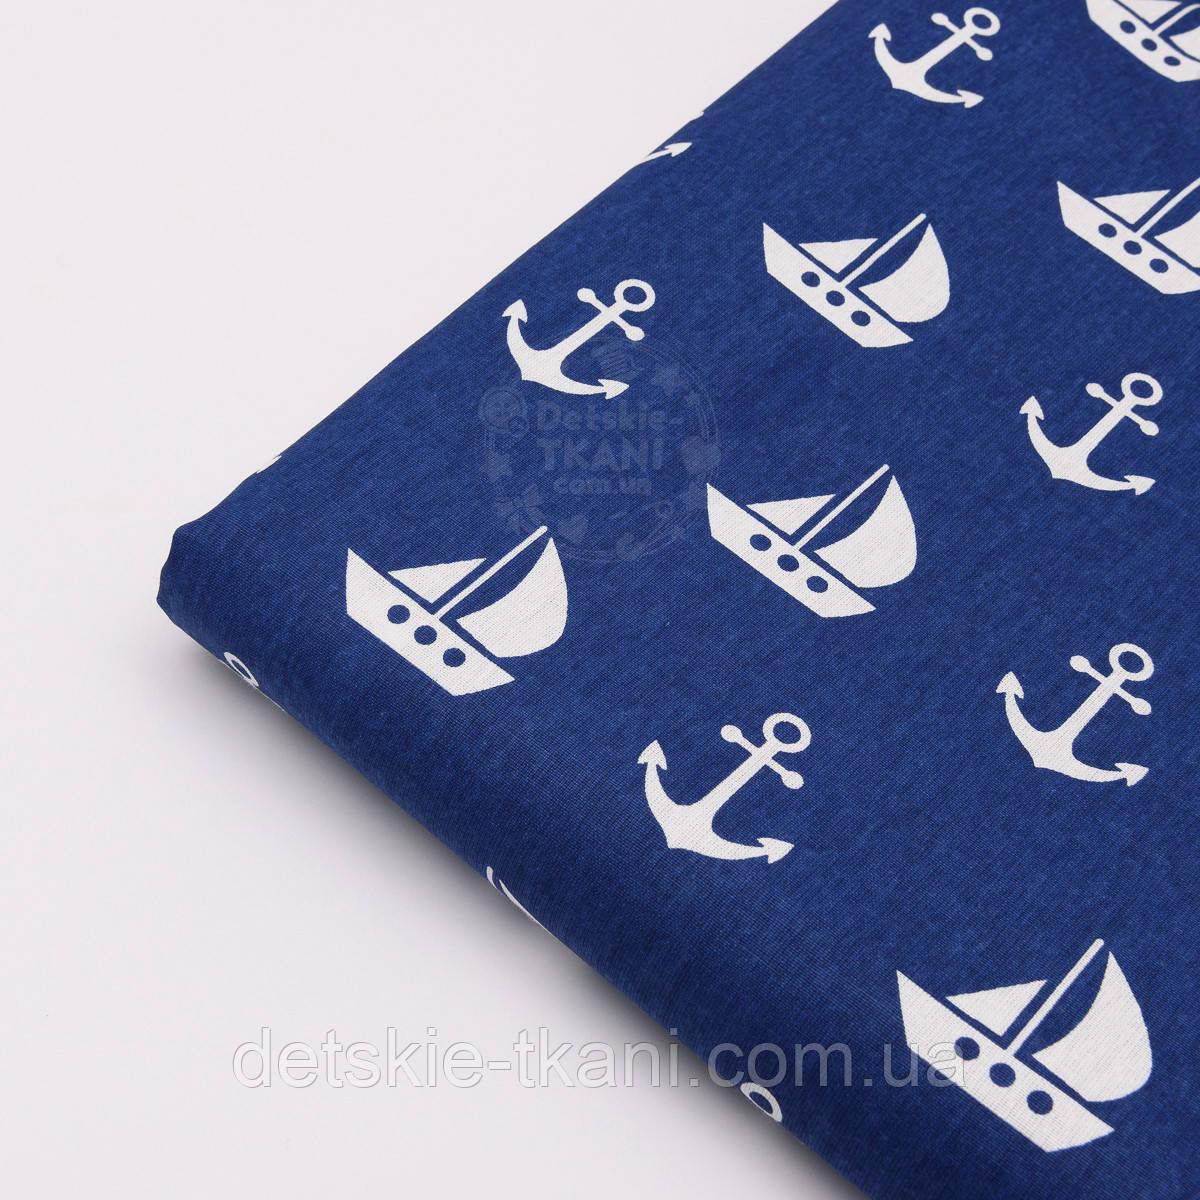 Лоскут ткани №588 синего цвета с парусниками и якорями